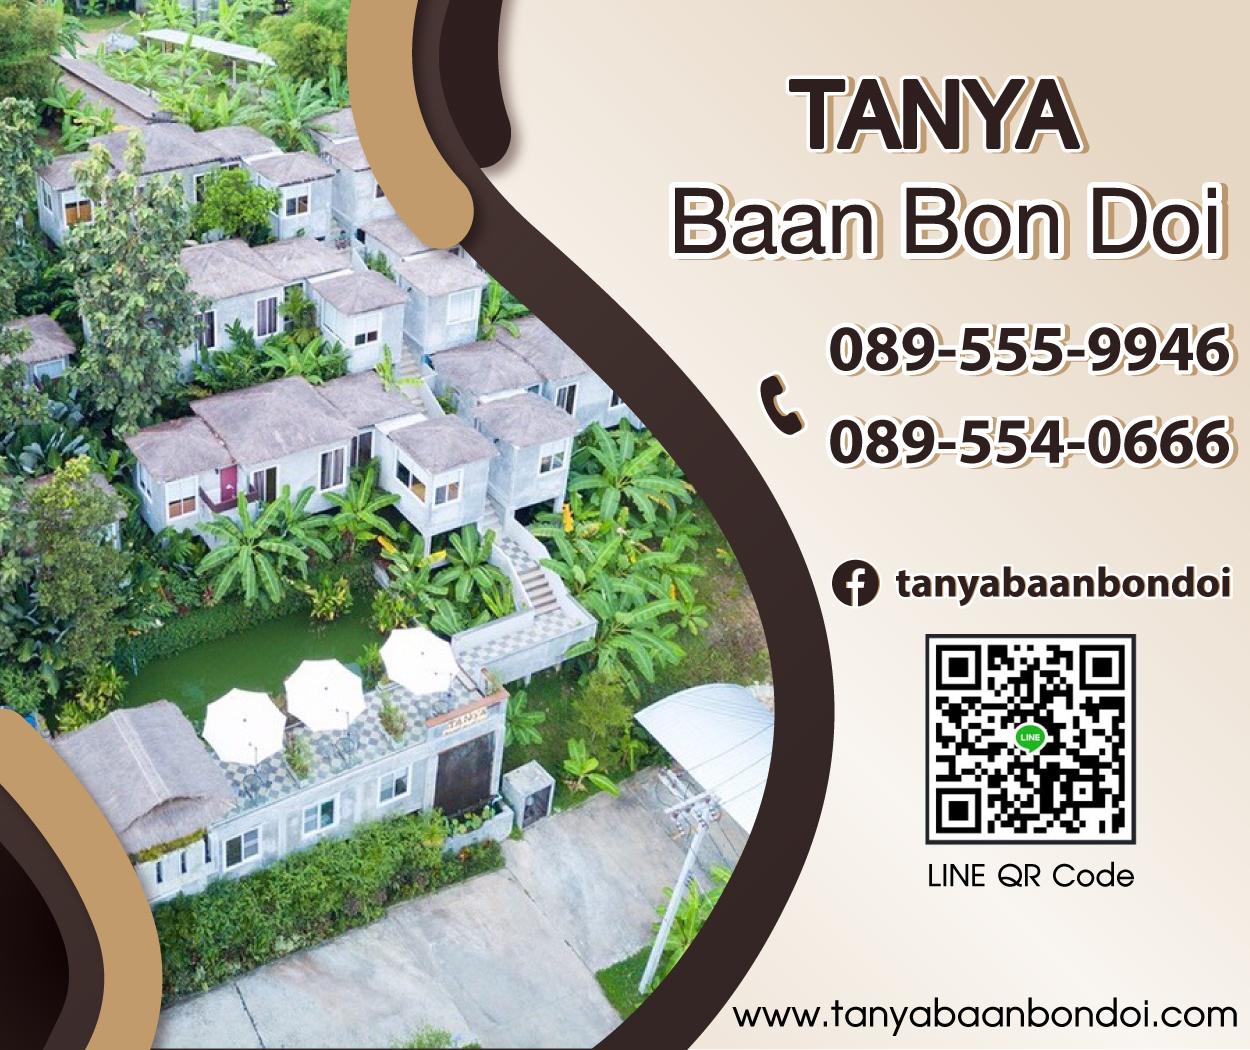 Tanya Baan Bon Doi Chiangrai